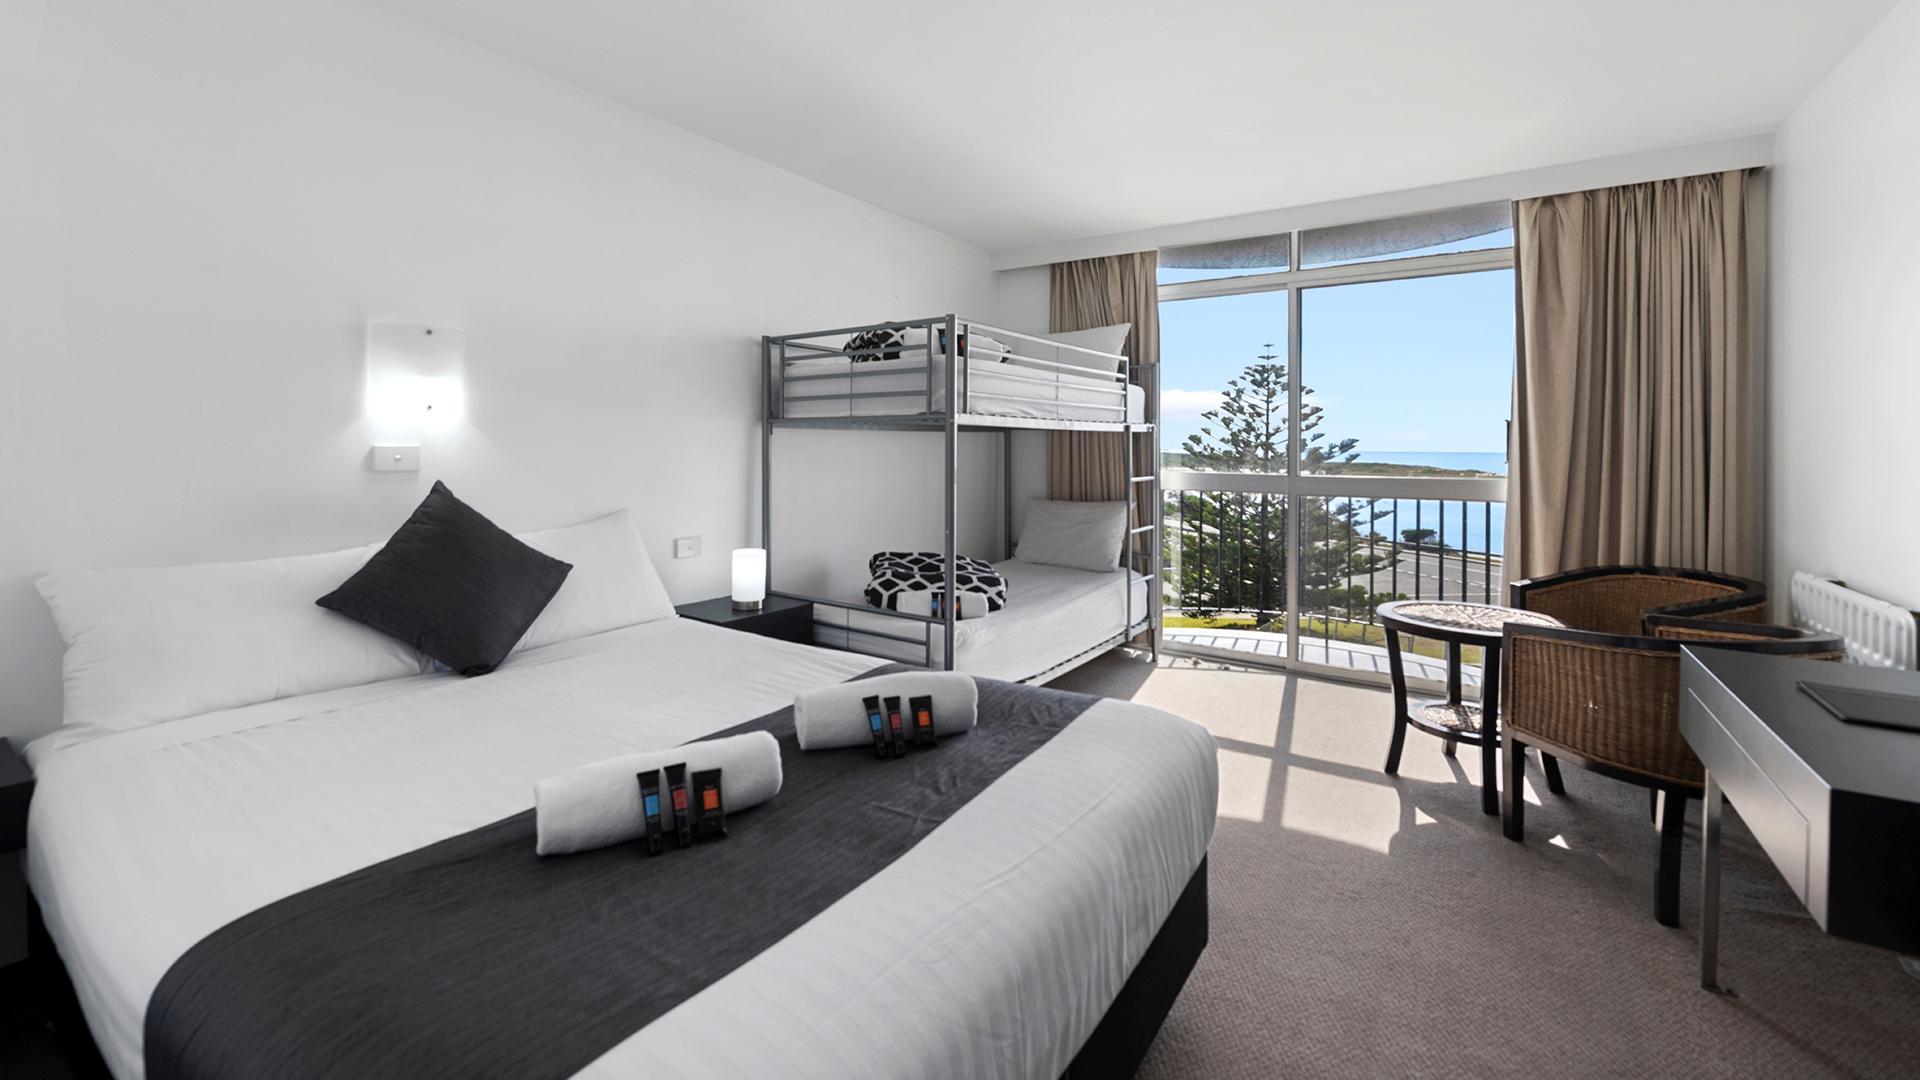 Family Room image 1 at Scamander Beach Resort by Break O'Day Council, Tasmania, Australia